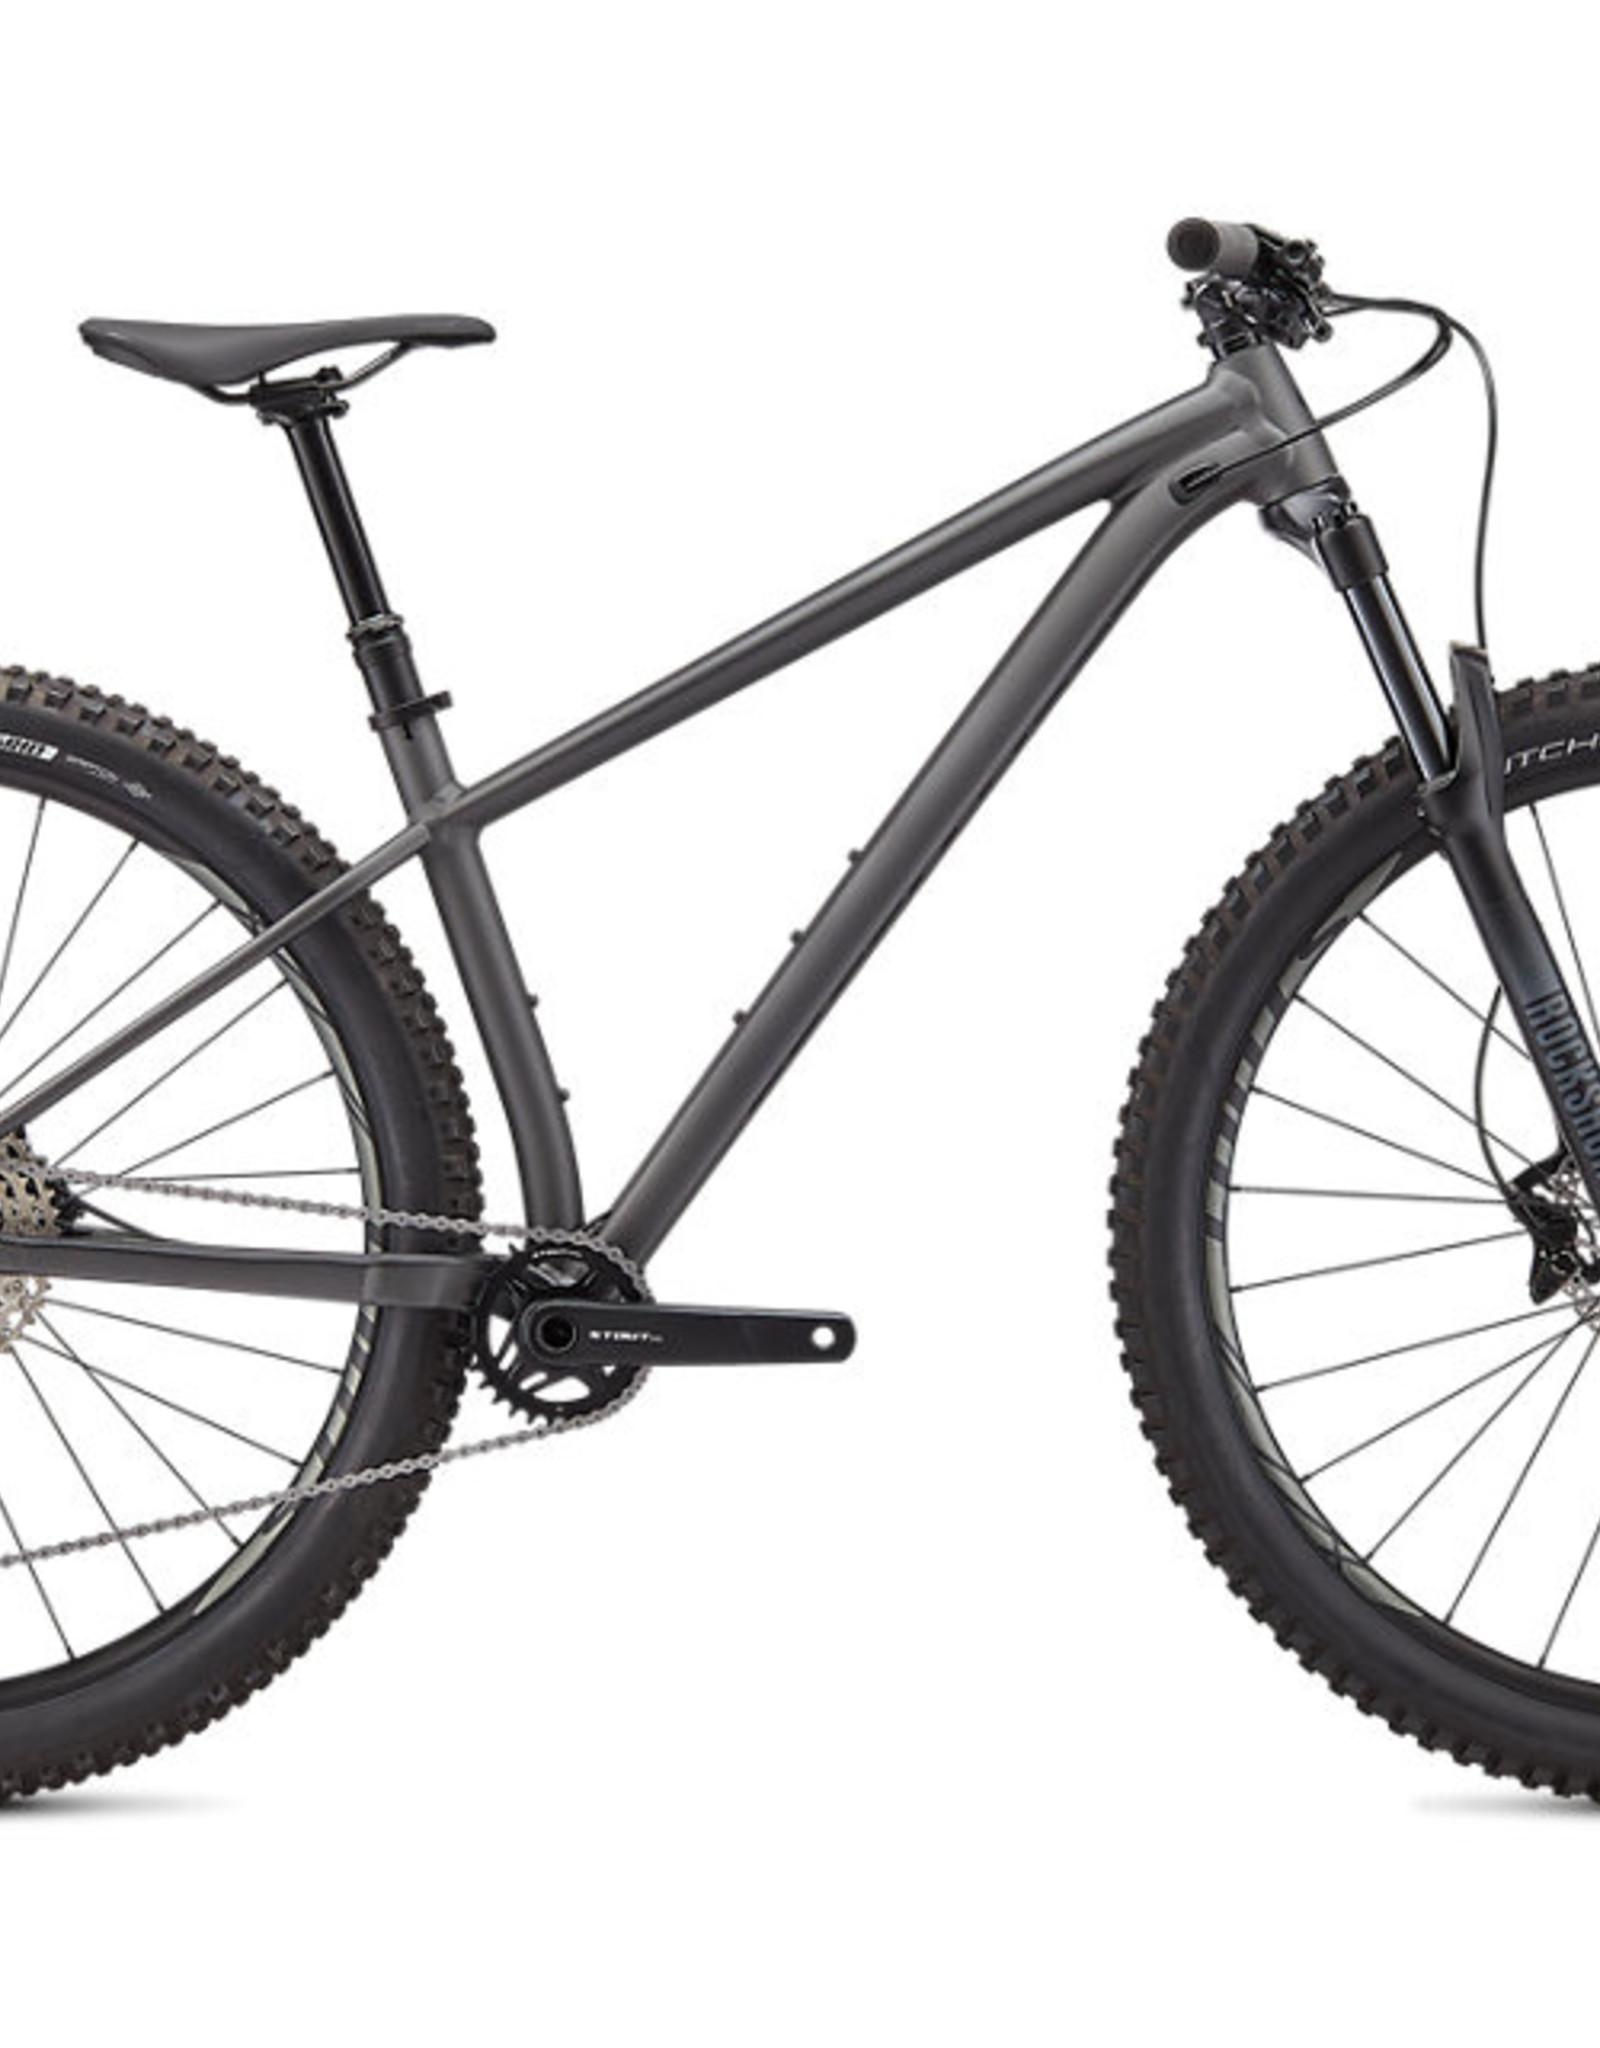 Specialized Specialized Fuse Comp 29 Trail Bike